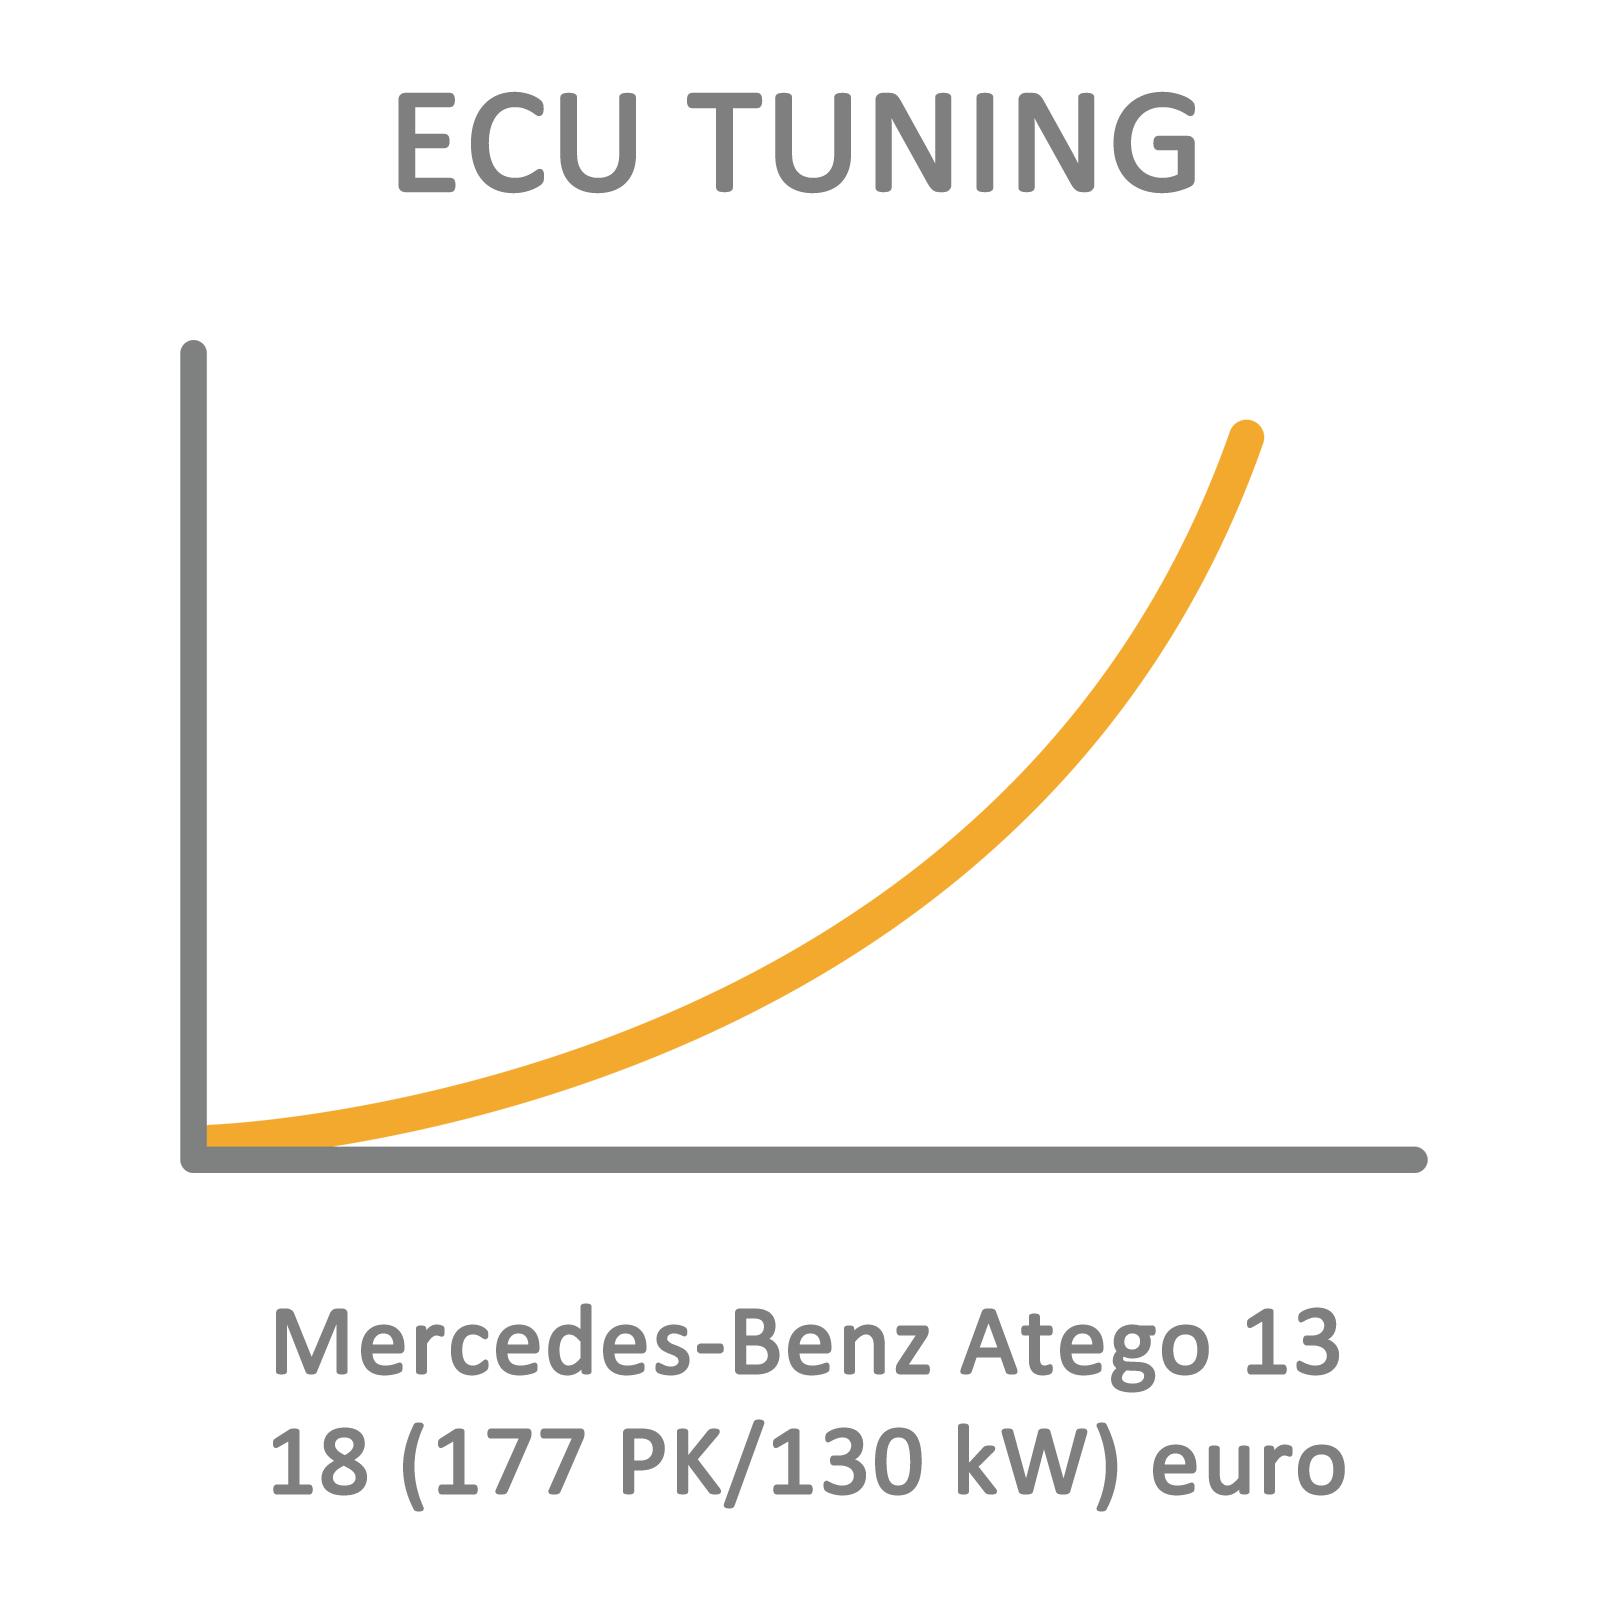 Mercedes-Benz Atego 13 18 (177 PK/130 kW) euro 3+4+5 ECU